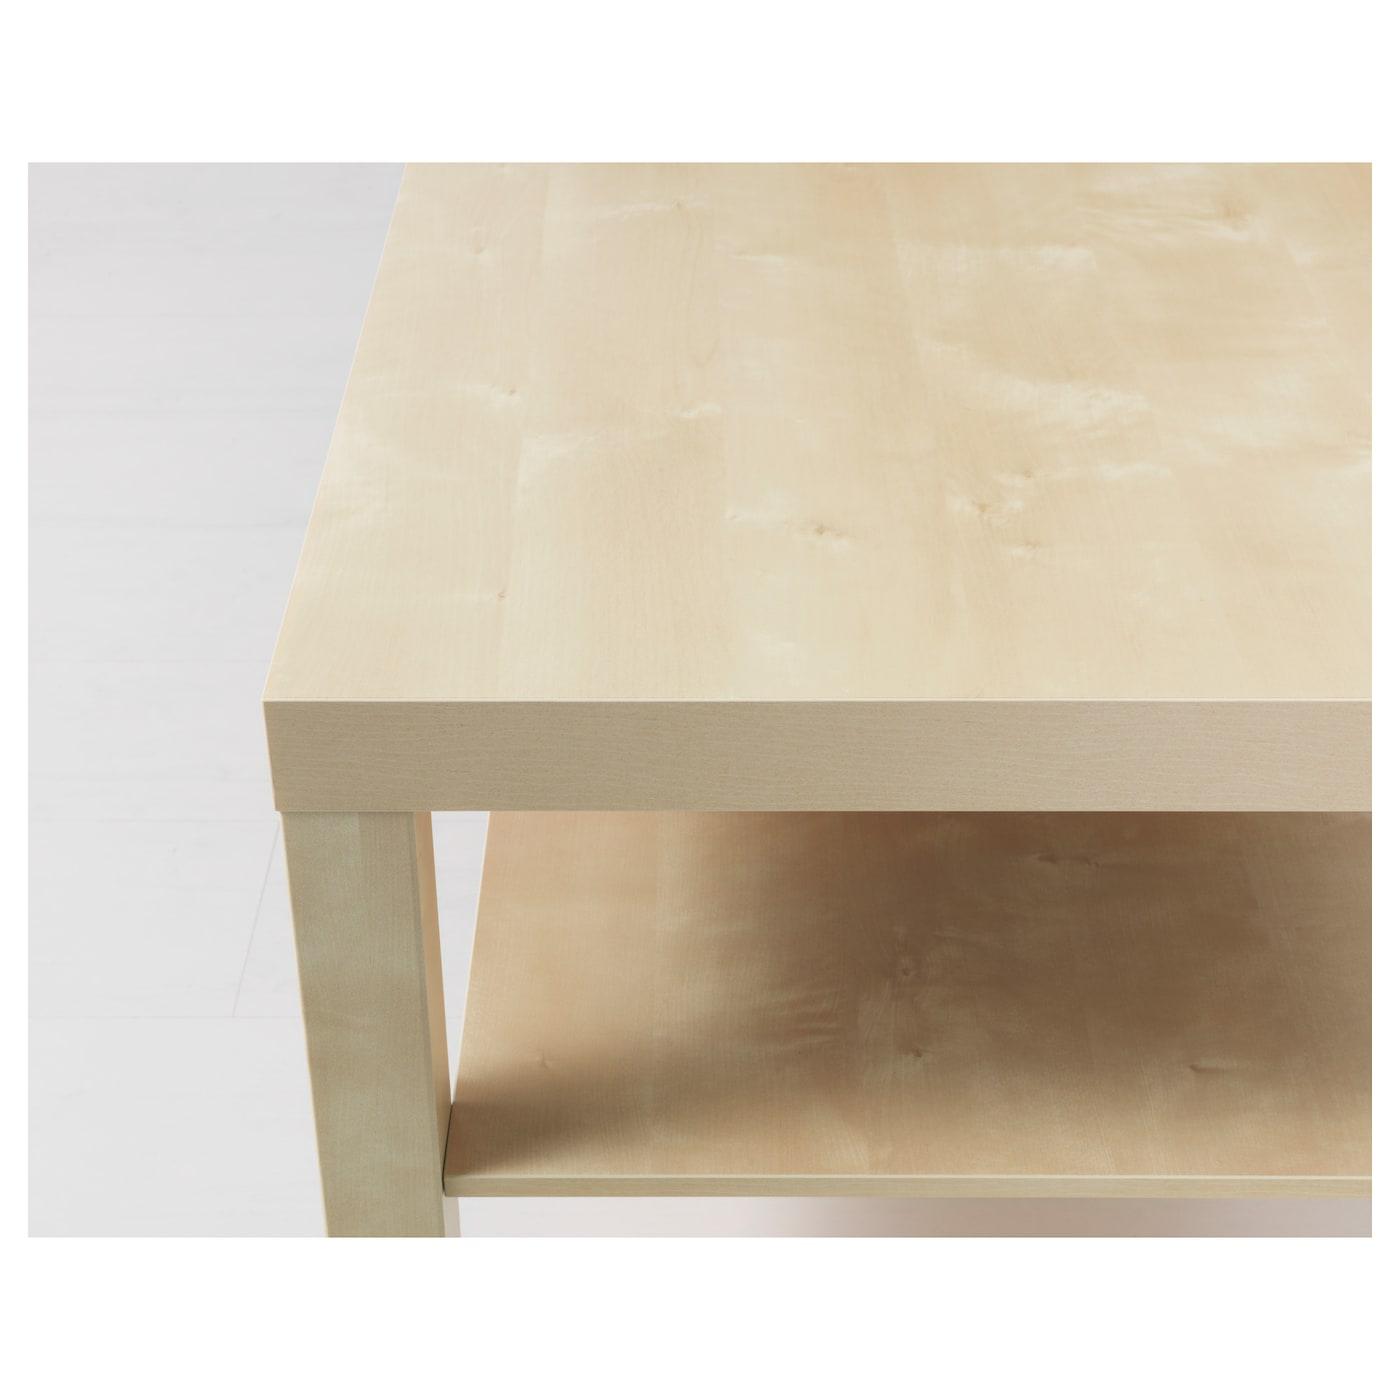 Lack coffee table birch effect 90 x 55 cm ikea - Table basse ikea lack ...